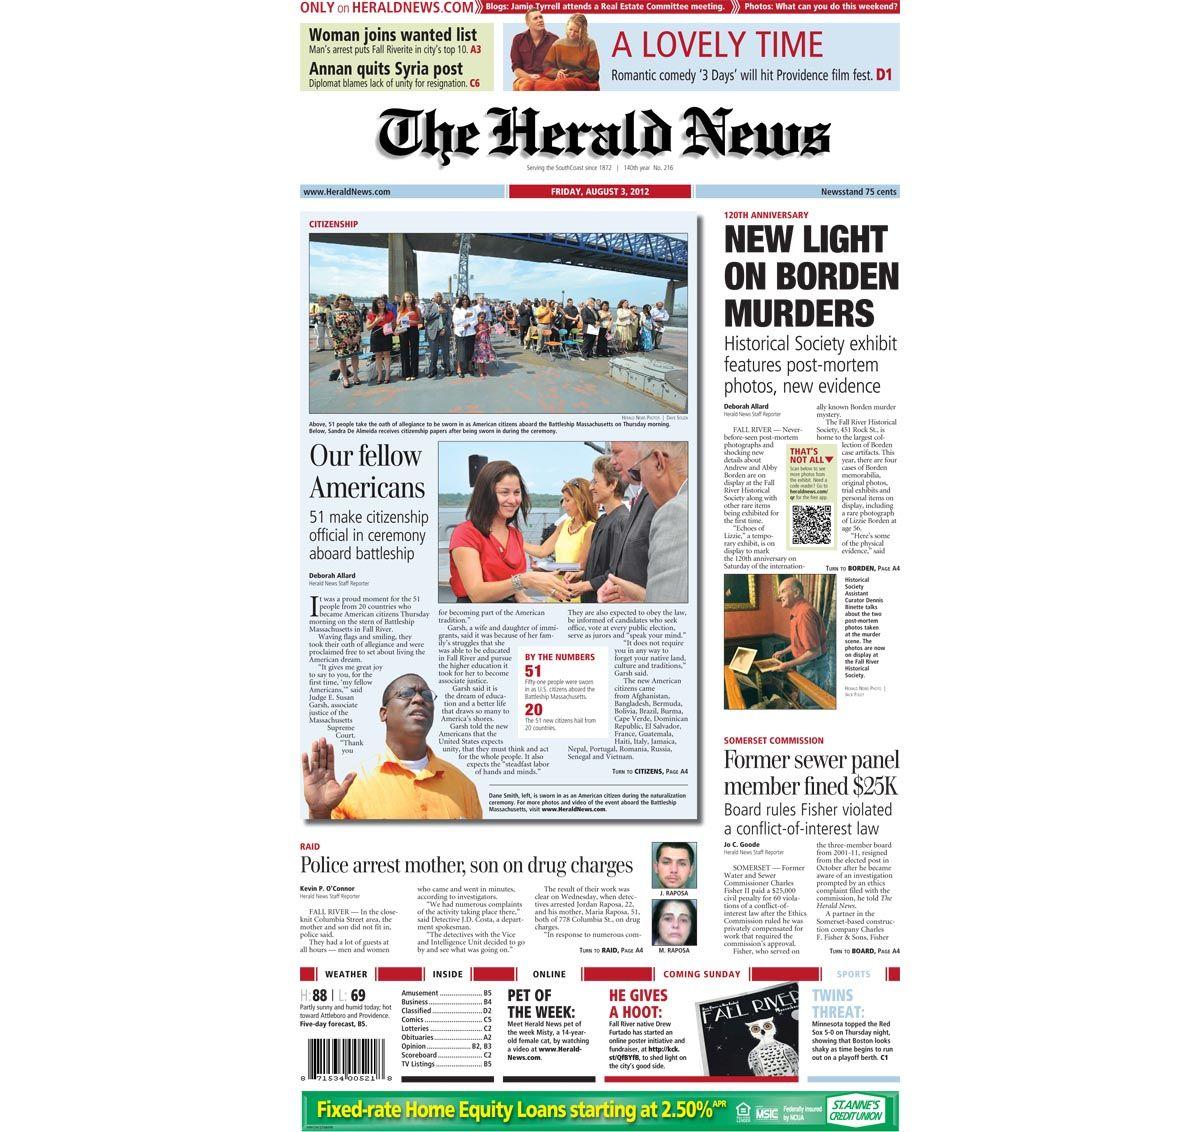 FallRiver HeraldNews FrontPage for Friday, Aug. 3, 2012